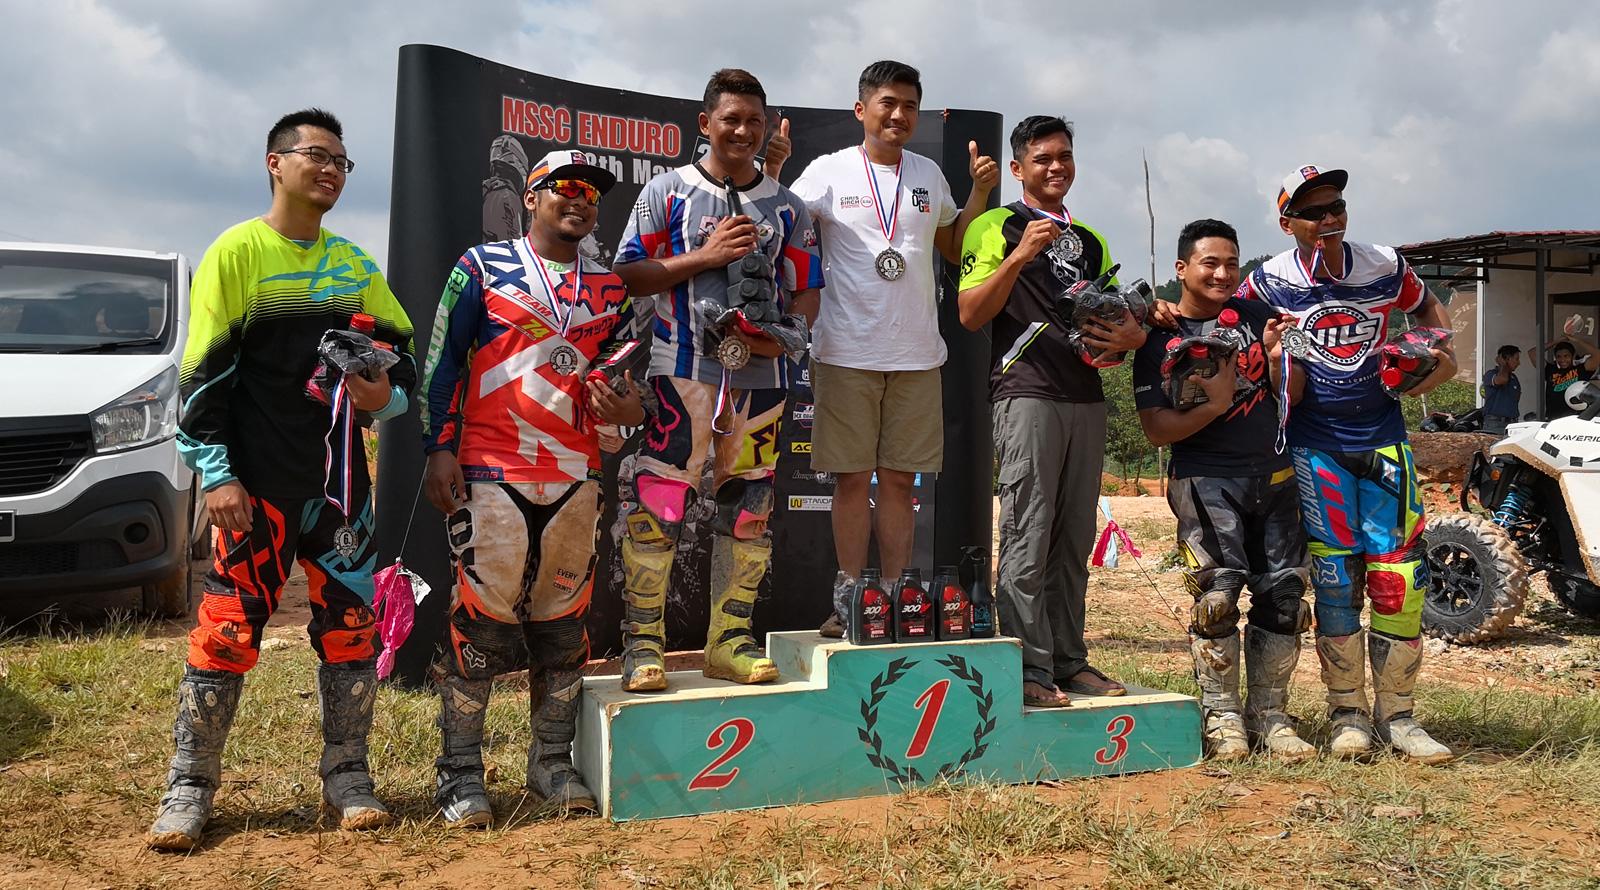 MSSC Enduro Race 2018 Big Trailies class